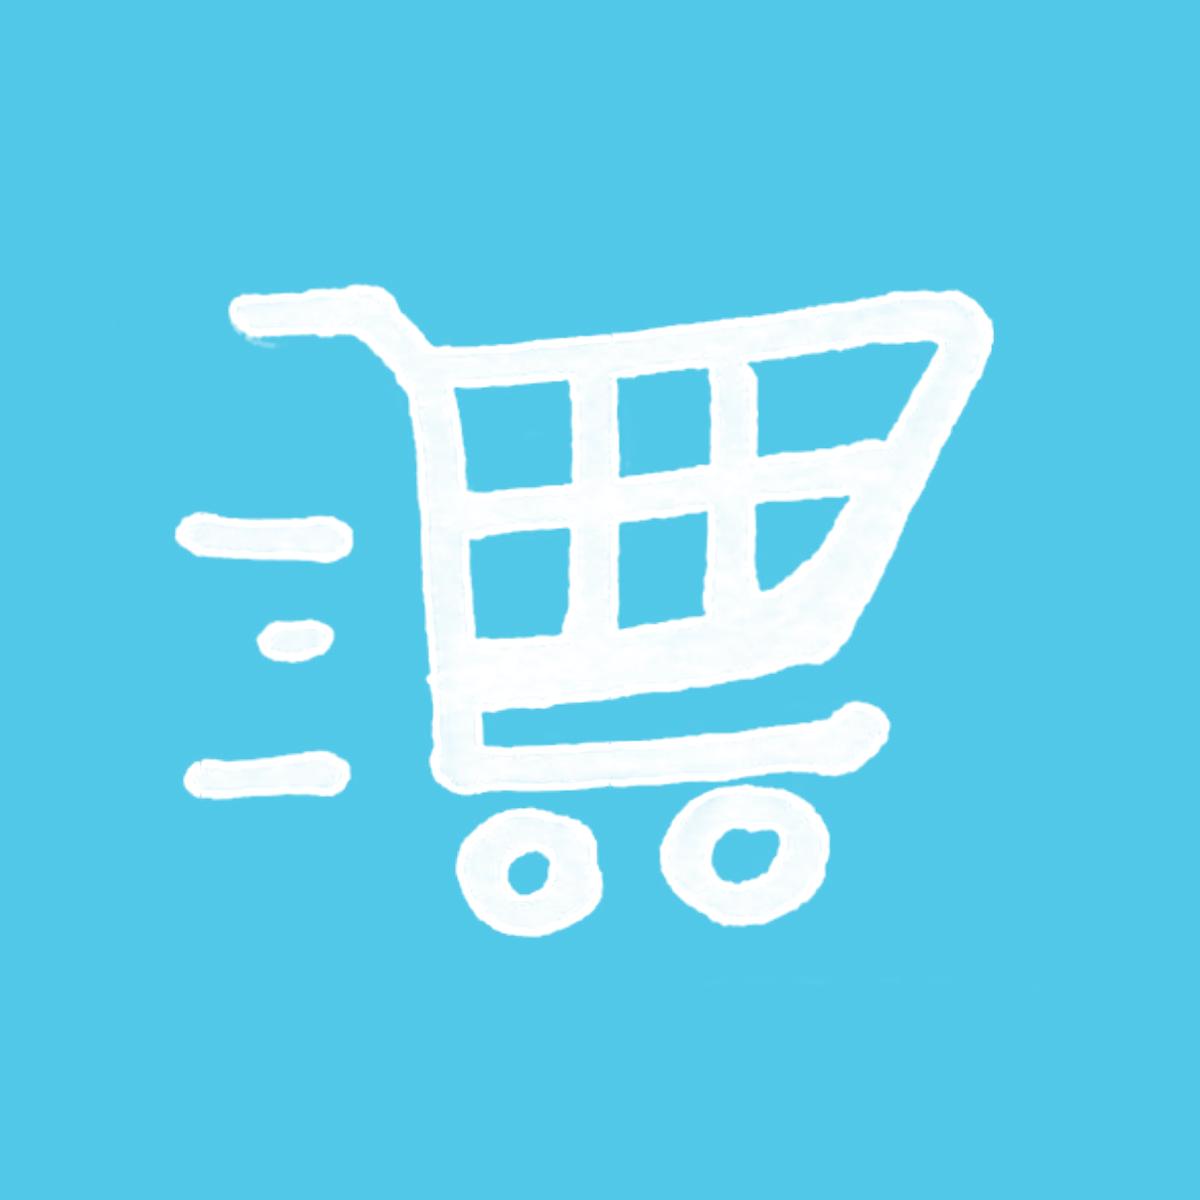 https://reasonstreet.co/e-retail/